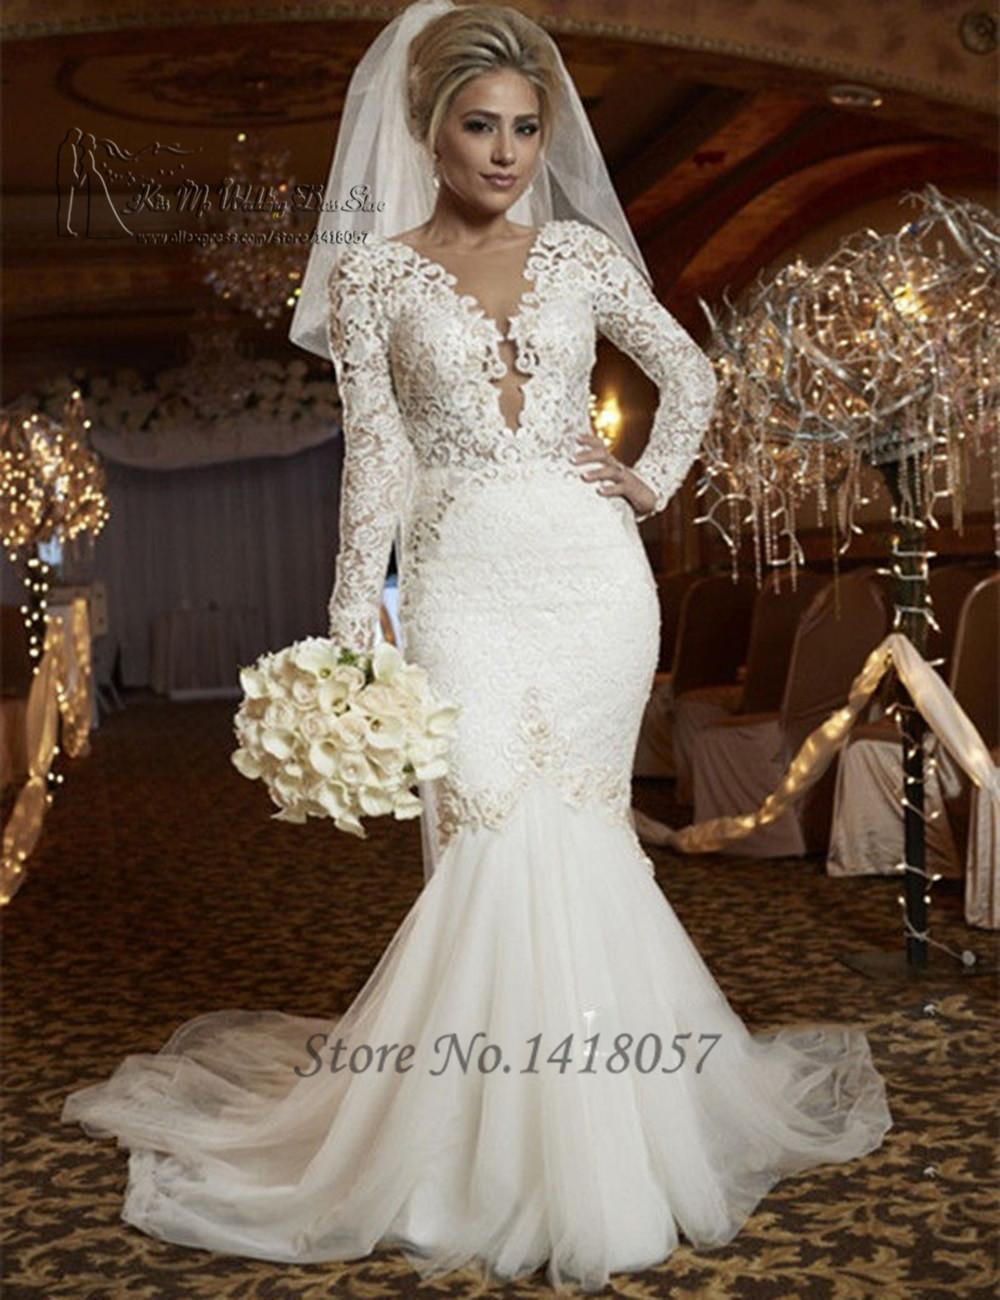 Wedding Long Sleeve Mermaid Wedding Dresses 17 best images about the dress on pinterest trumpet wedding gowns lace long sleeve mermaid ocodea